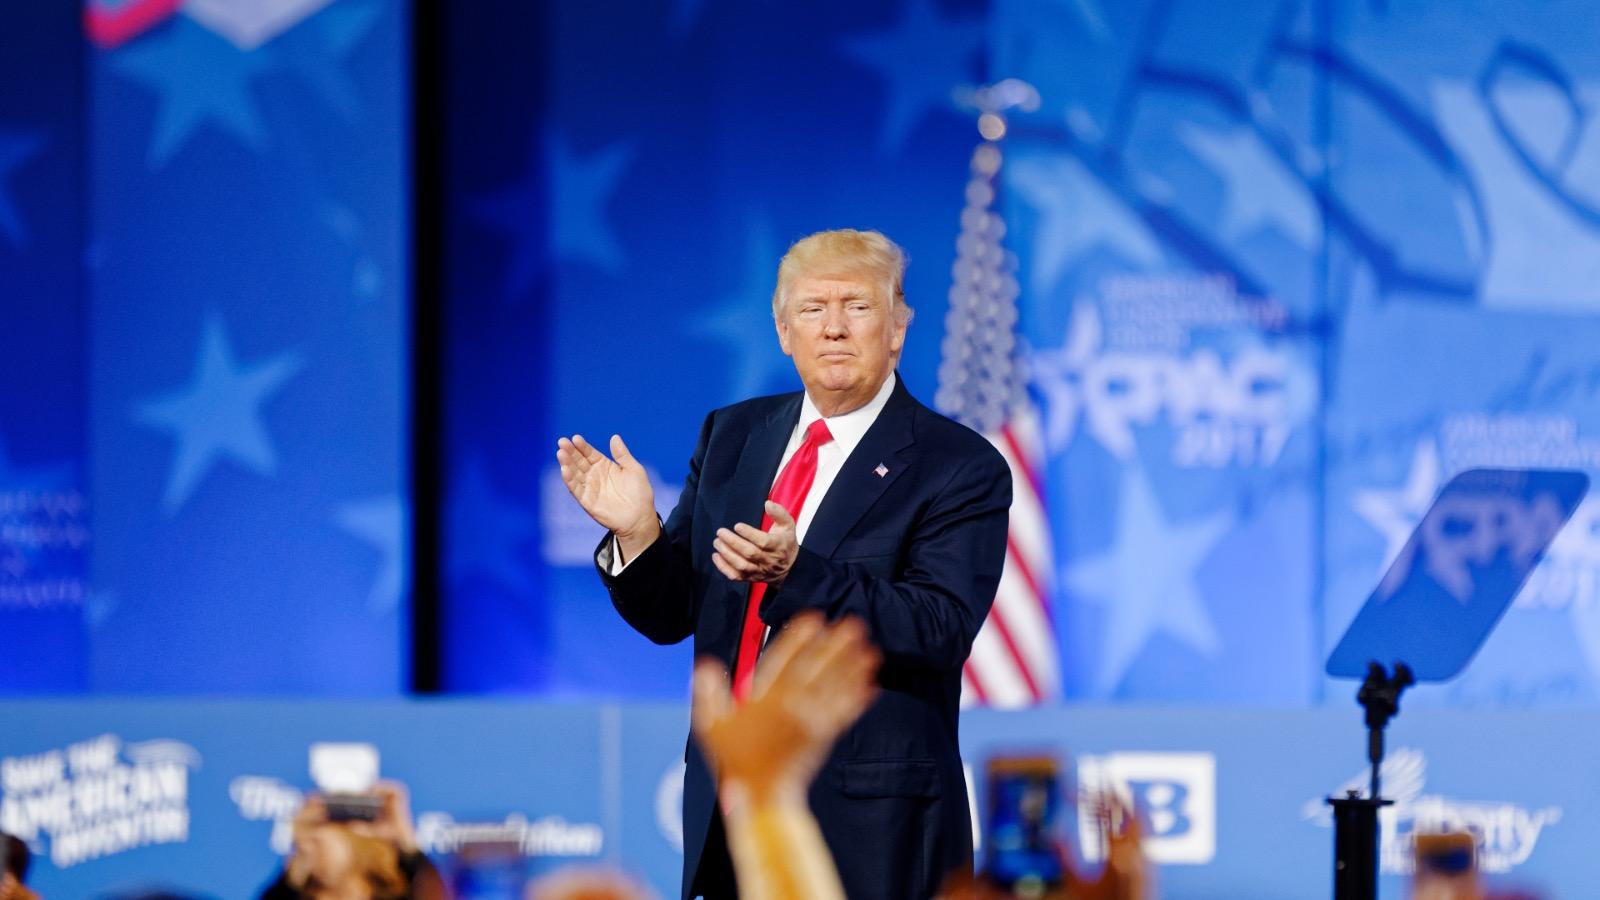 Peter Lauritsen: Trump truer demokratiet. Hvor er den danske reaktion?